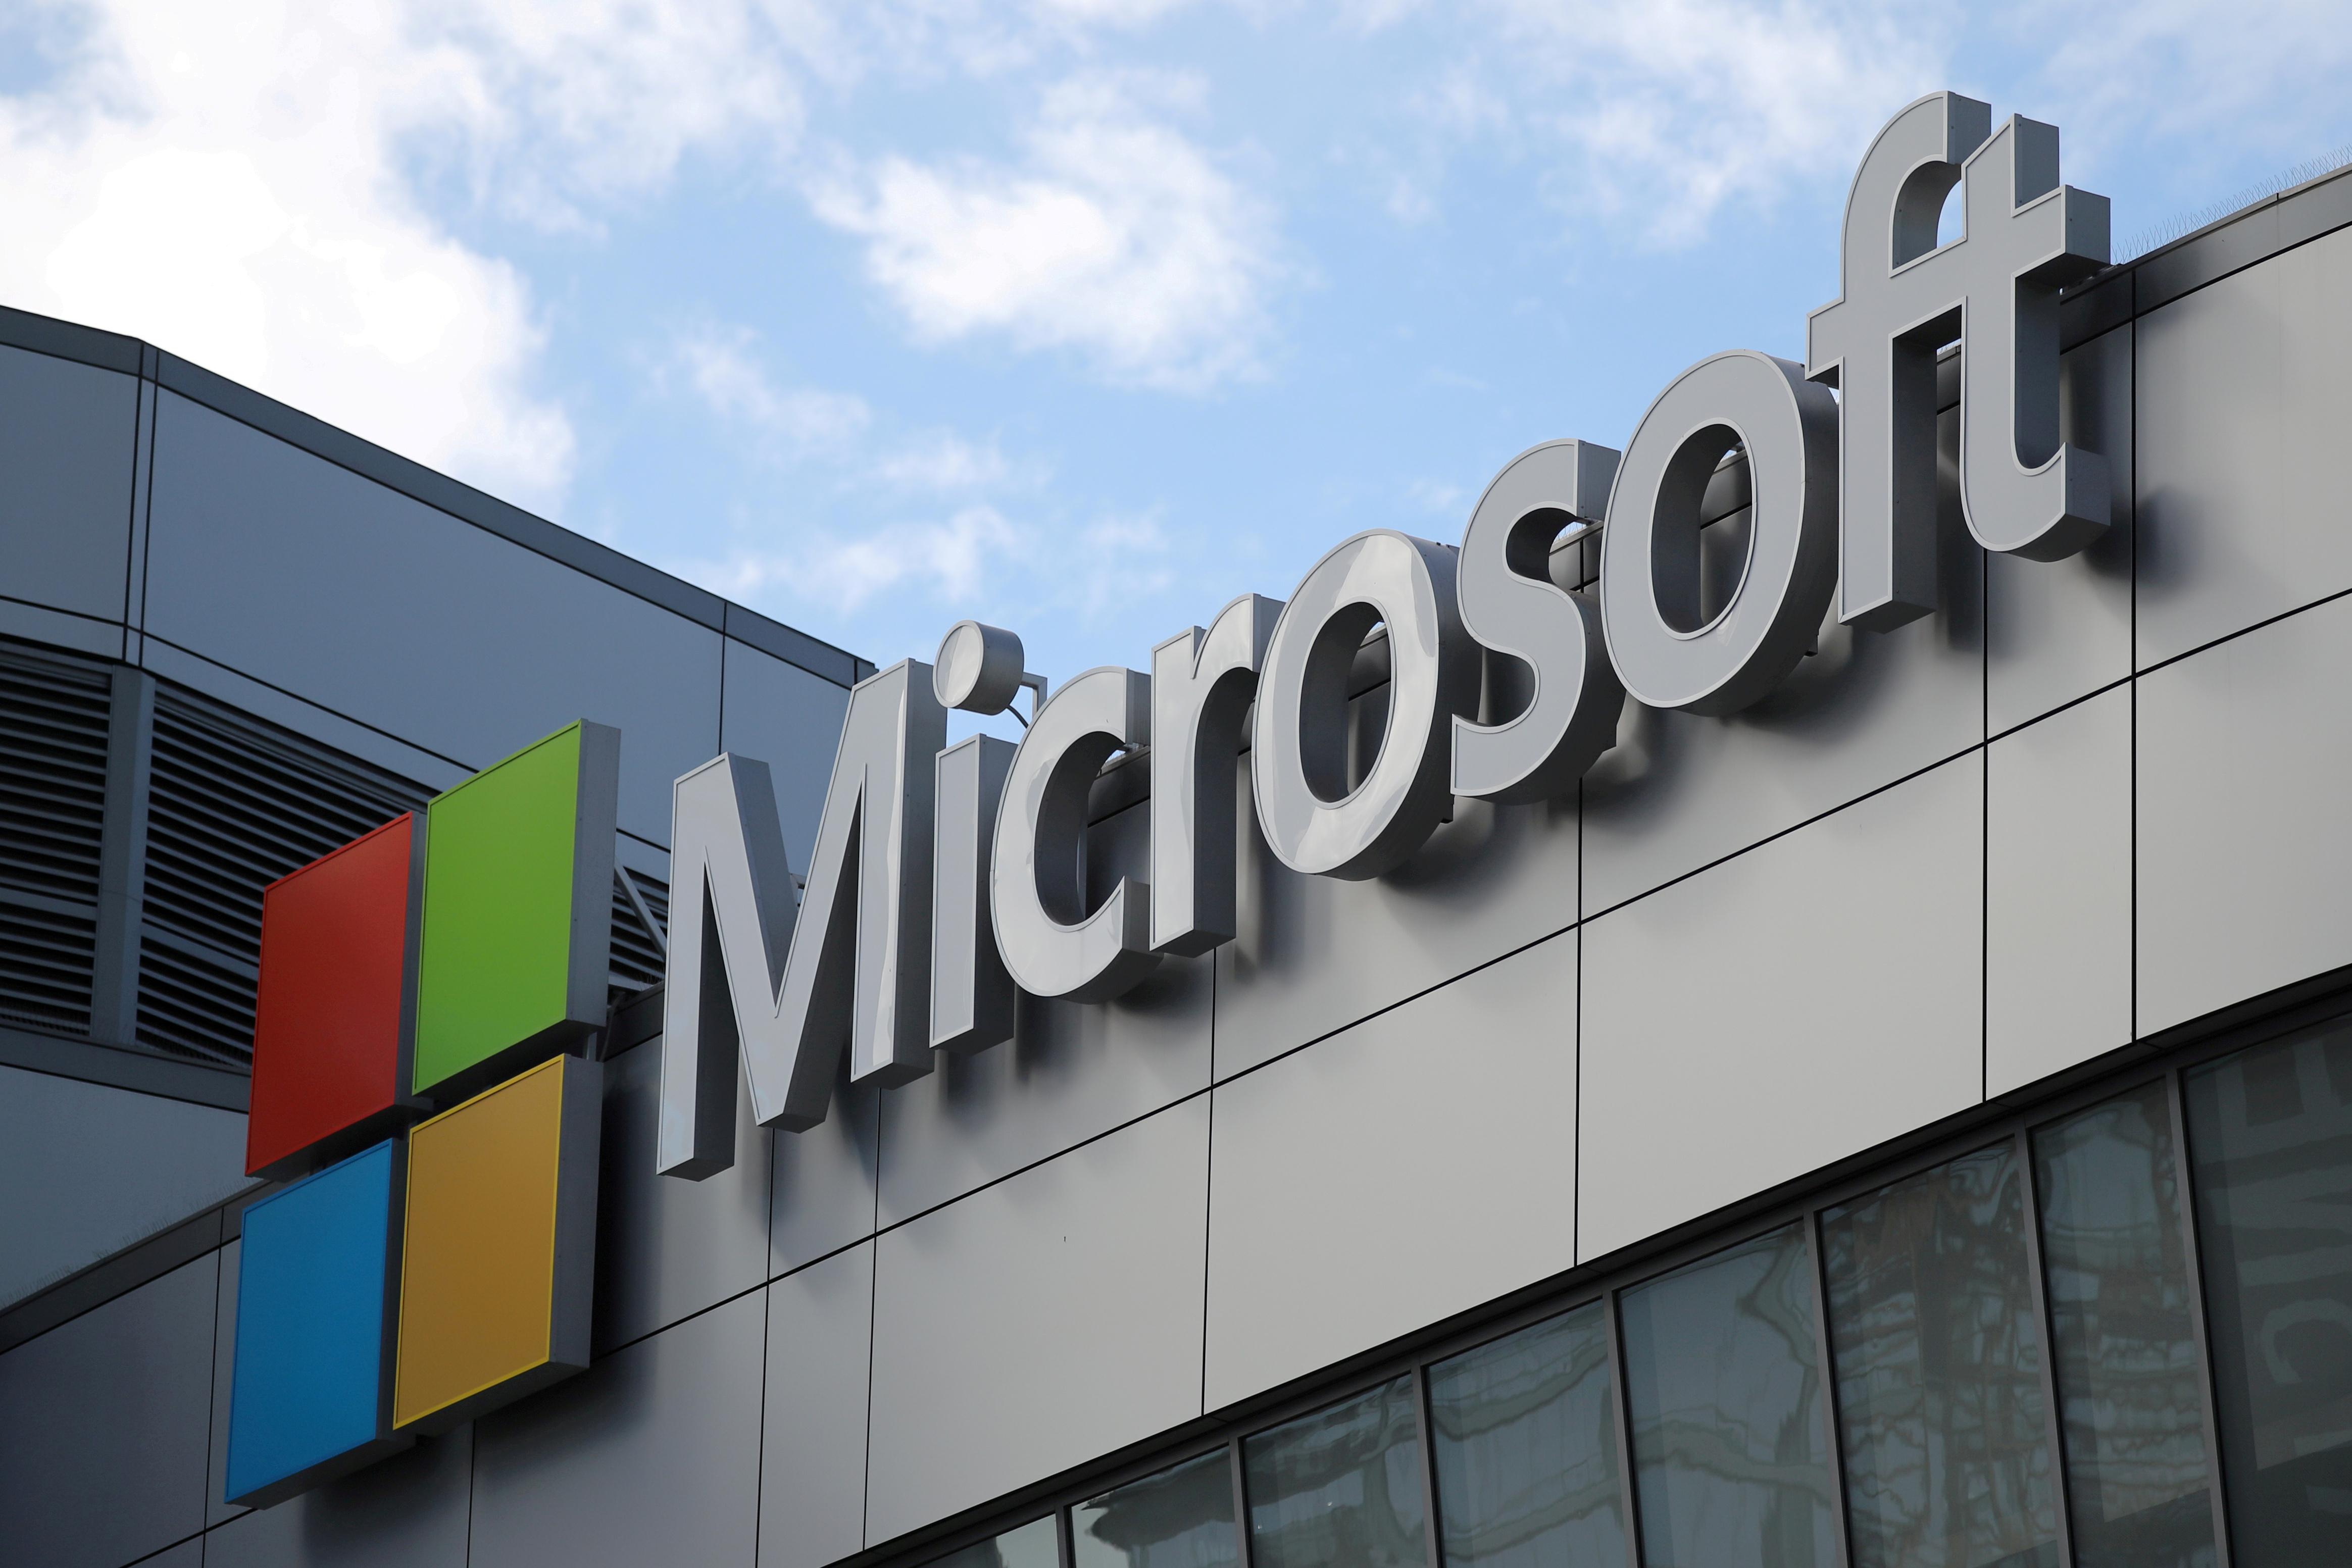 A Microsoft logo is seen in Los Angeles, California U.S. November 7, 2017. REUTERS/Lucy Nicholson/File Photo